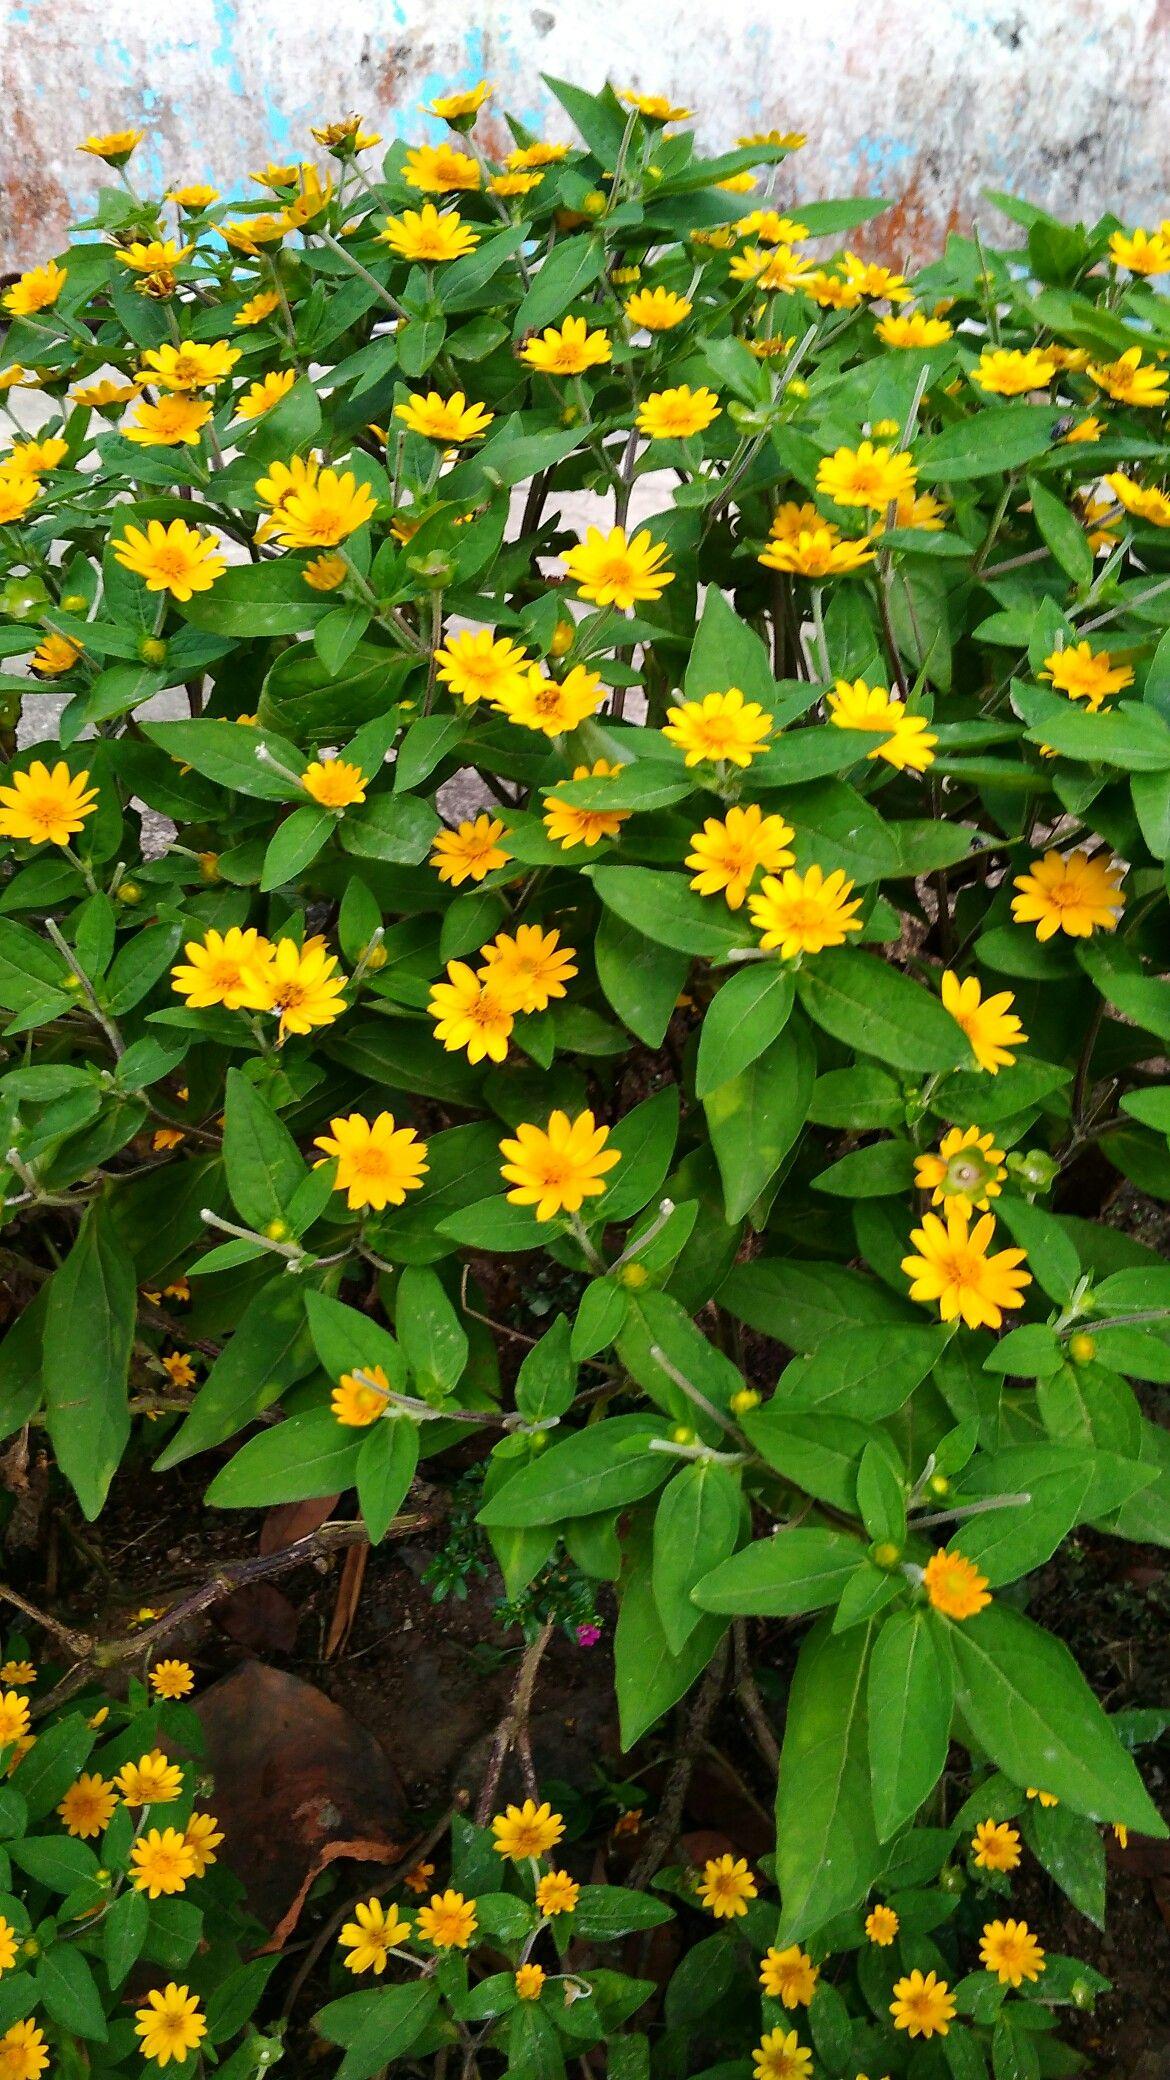 Bunga Matahari Kecil Bogor Bunga Bunga Matahari Matahari